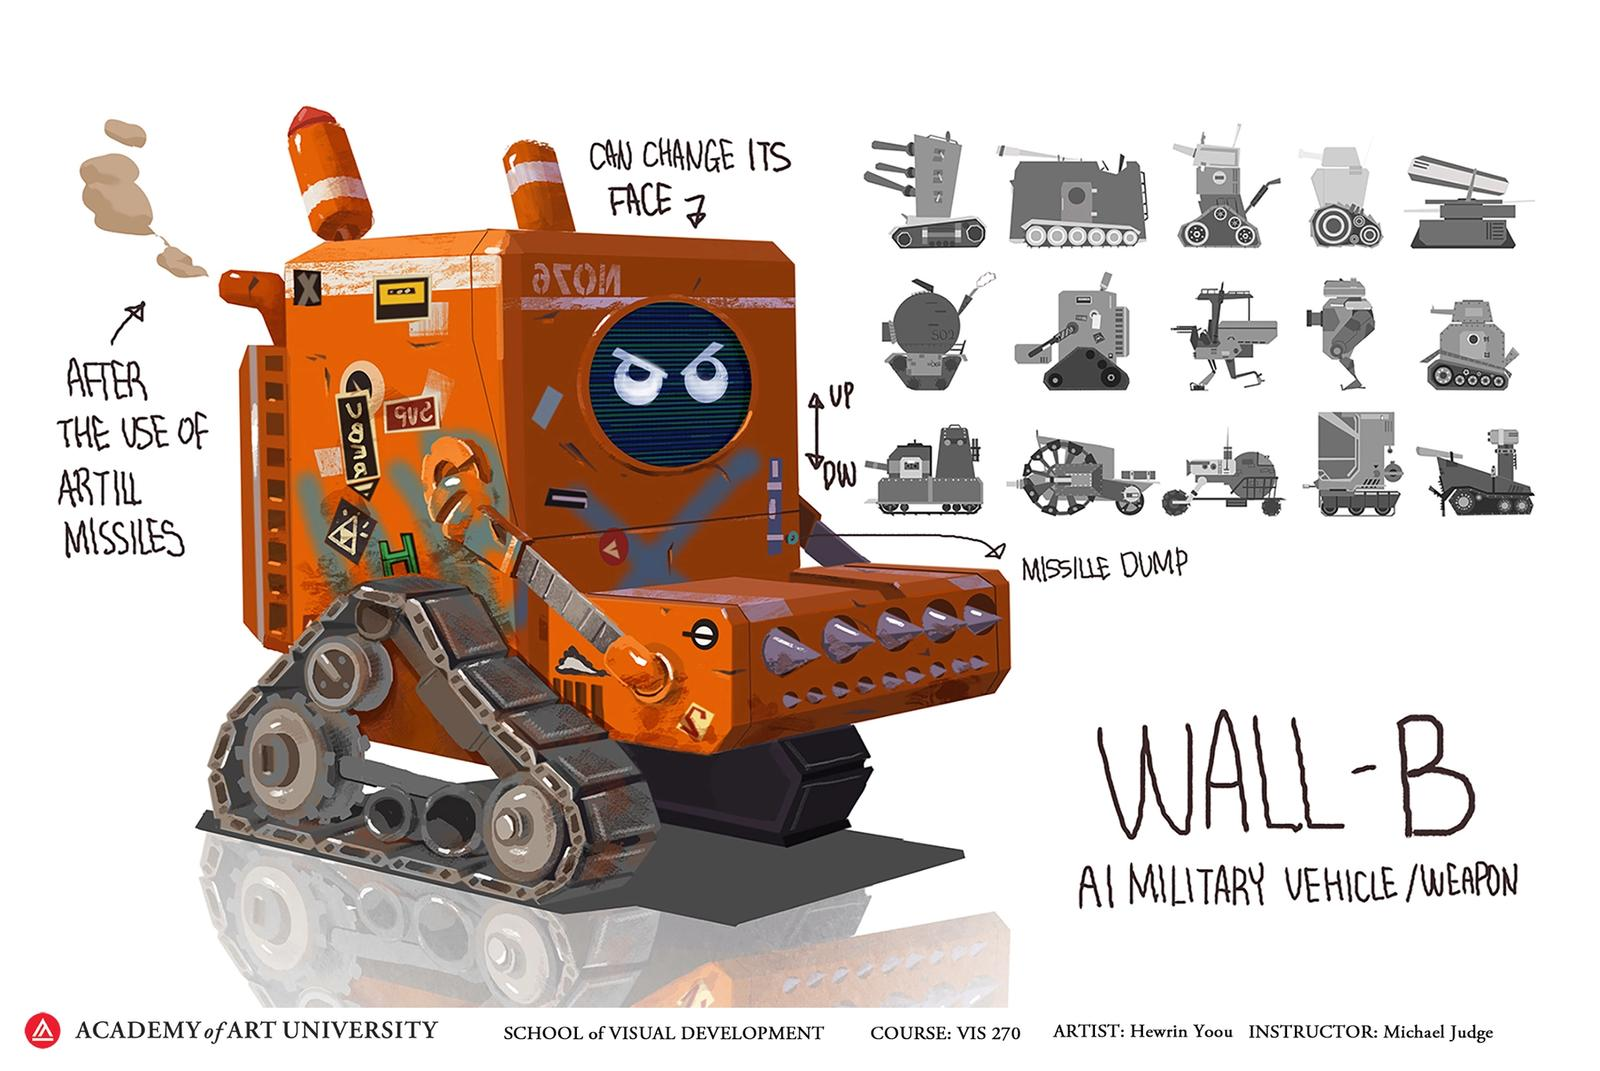 Wall-B - Hewrin Yoou